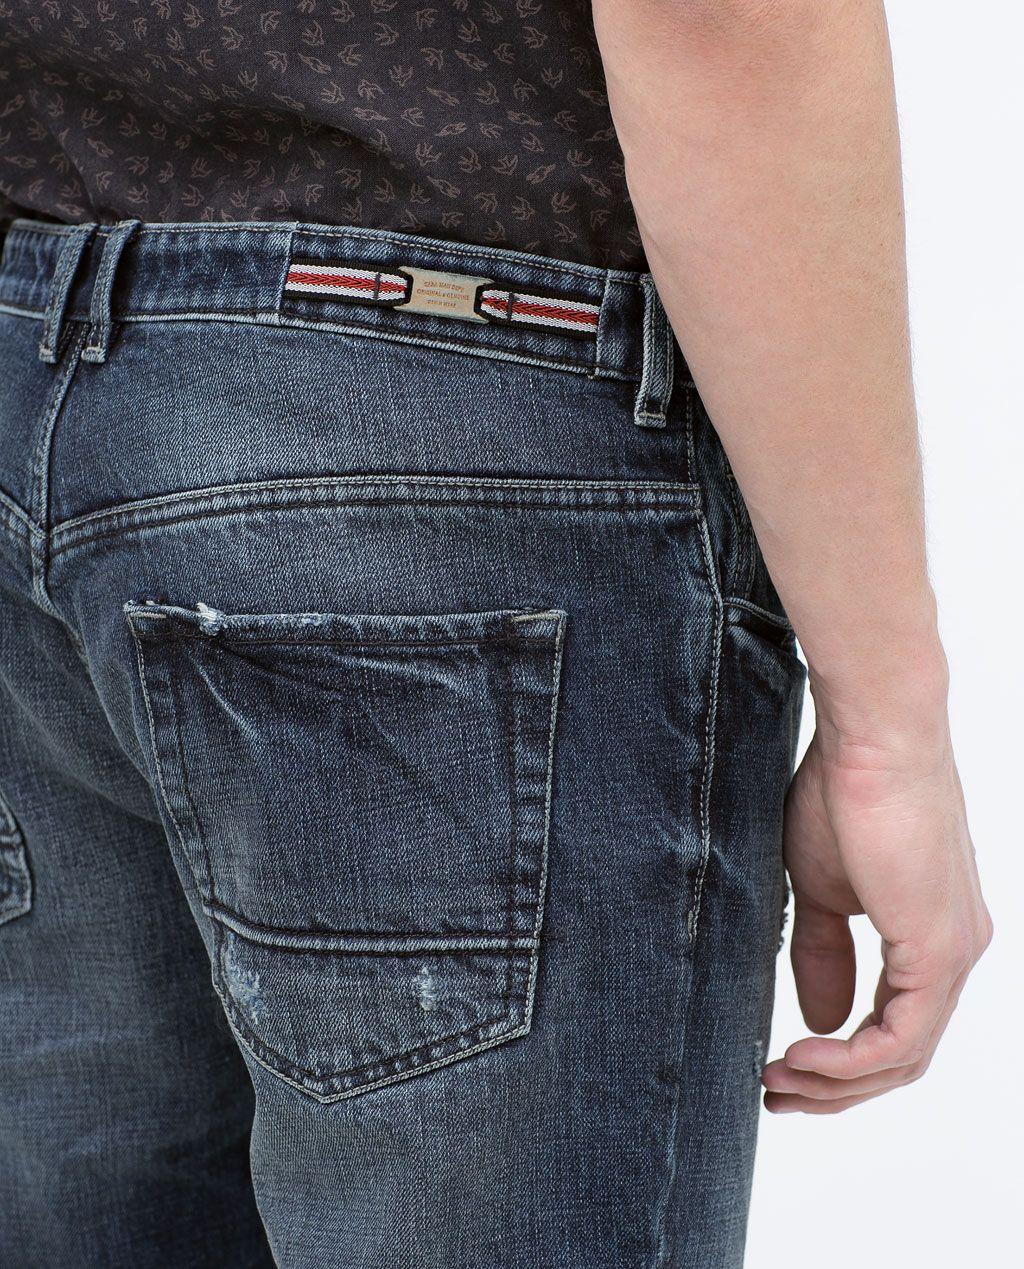 ESPRIT VERSUS PRADA | Jeans de moda, Pantalones de hombre